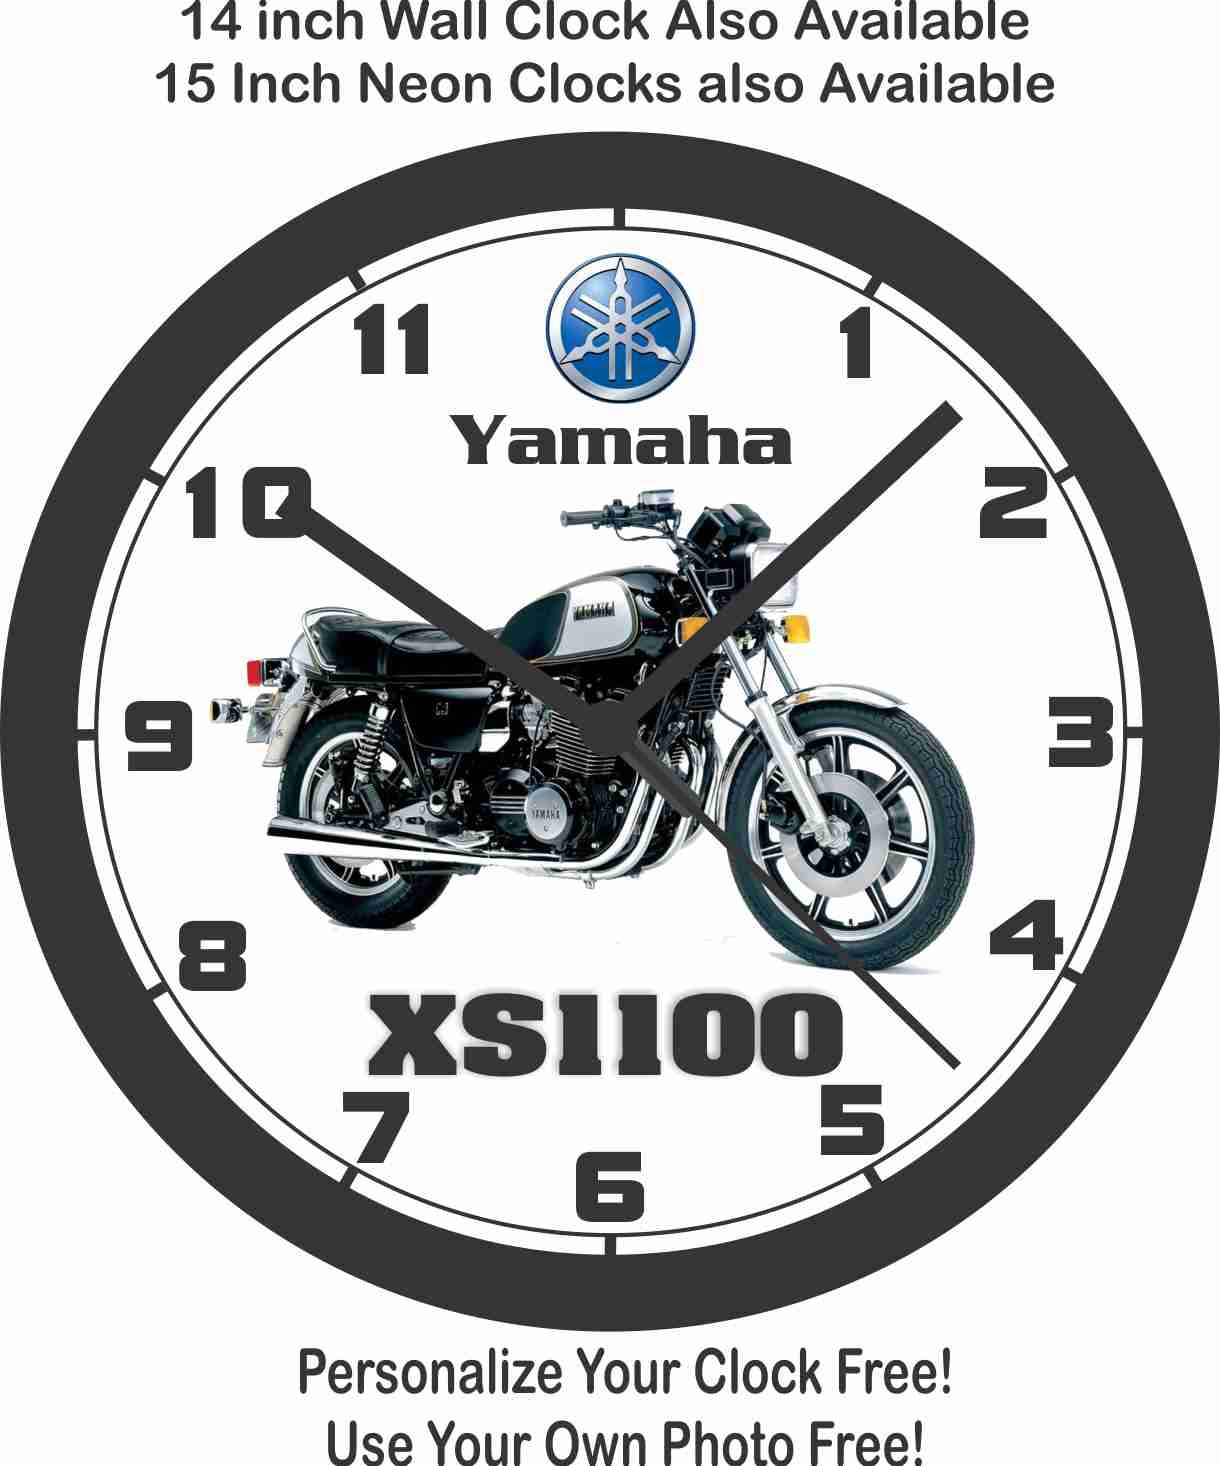 Amazon.com: 1978 yamaha XS1100 motocicleta reloj de pared ...